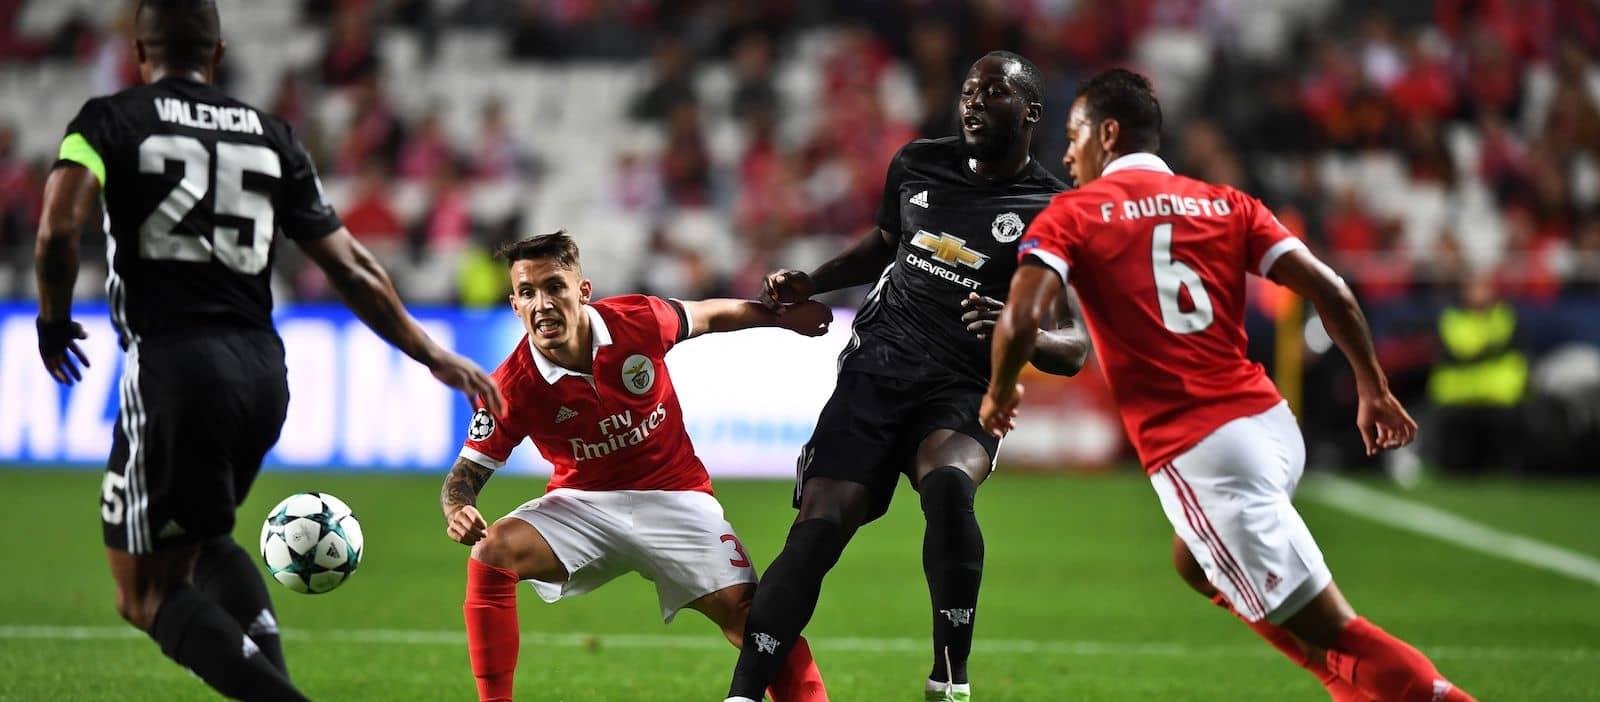 Zlatan Ibrahimovic hails Romelu Lukaku's superb start at Manchester United